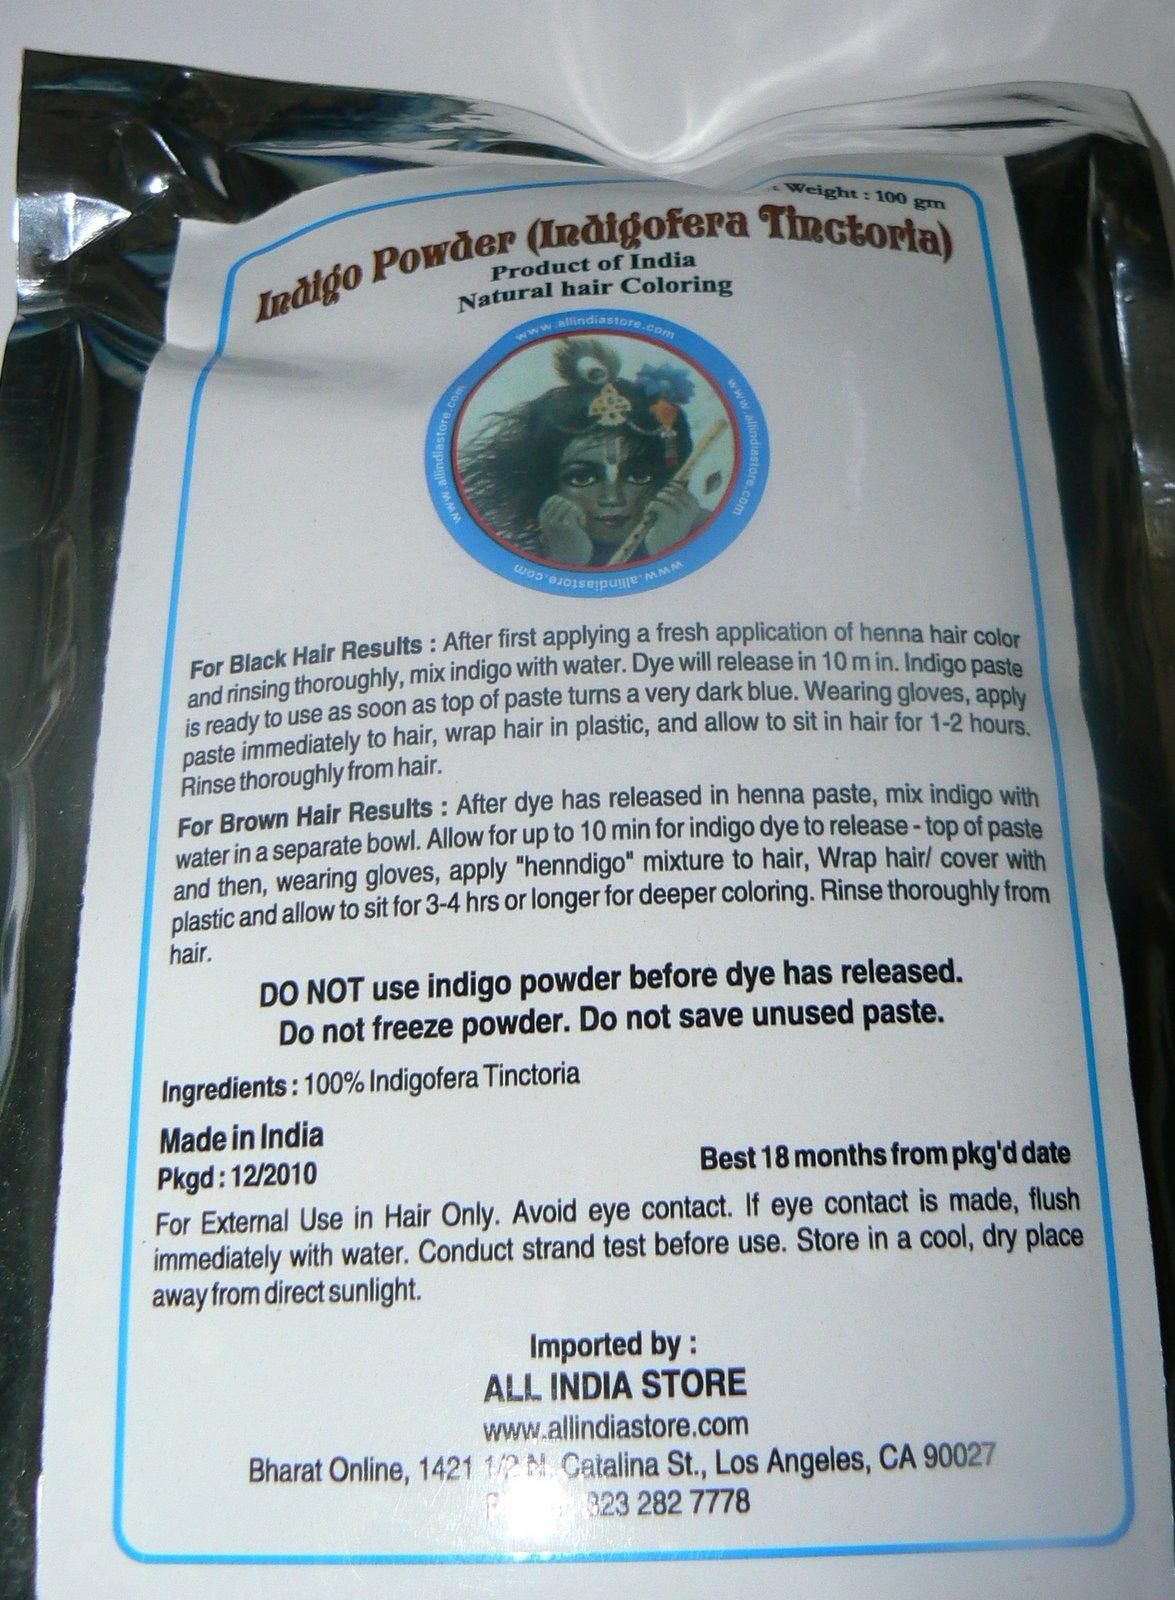 Indigo Powder ALL INDIA STORE BRAND 4 x 100 Grams Bags (14 oz total)Indigofera Tinctoria (wasma in Arabic and Urdu) Last Crop - by All India Store (Image #3)